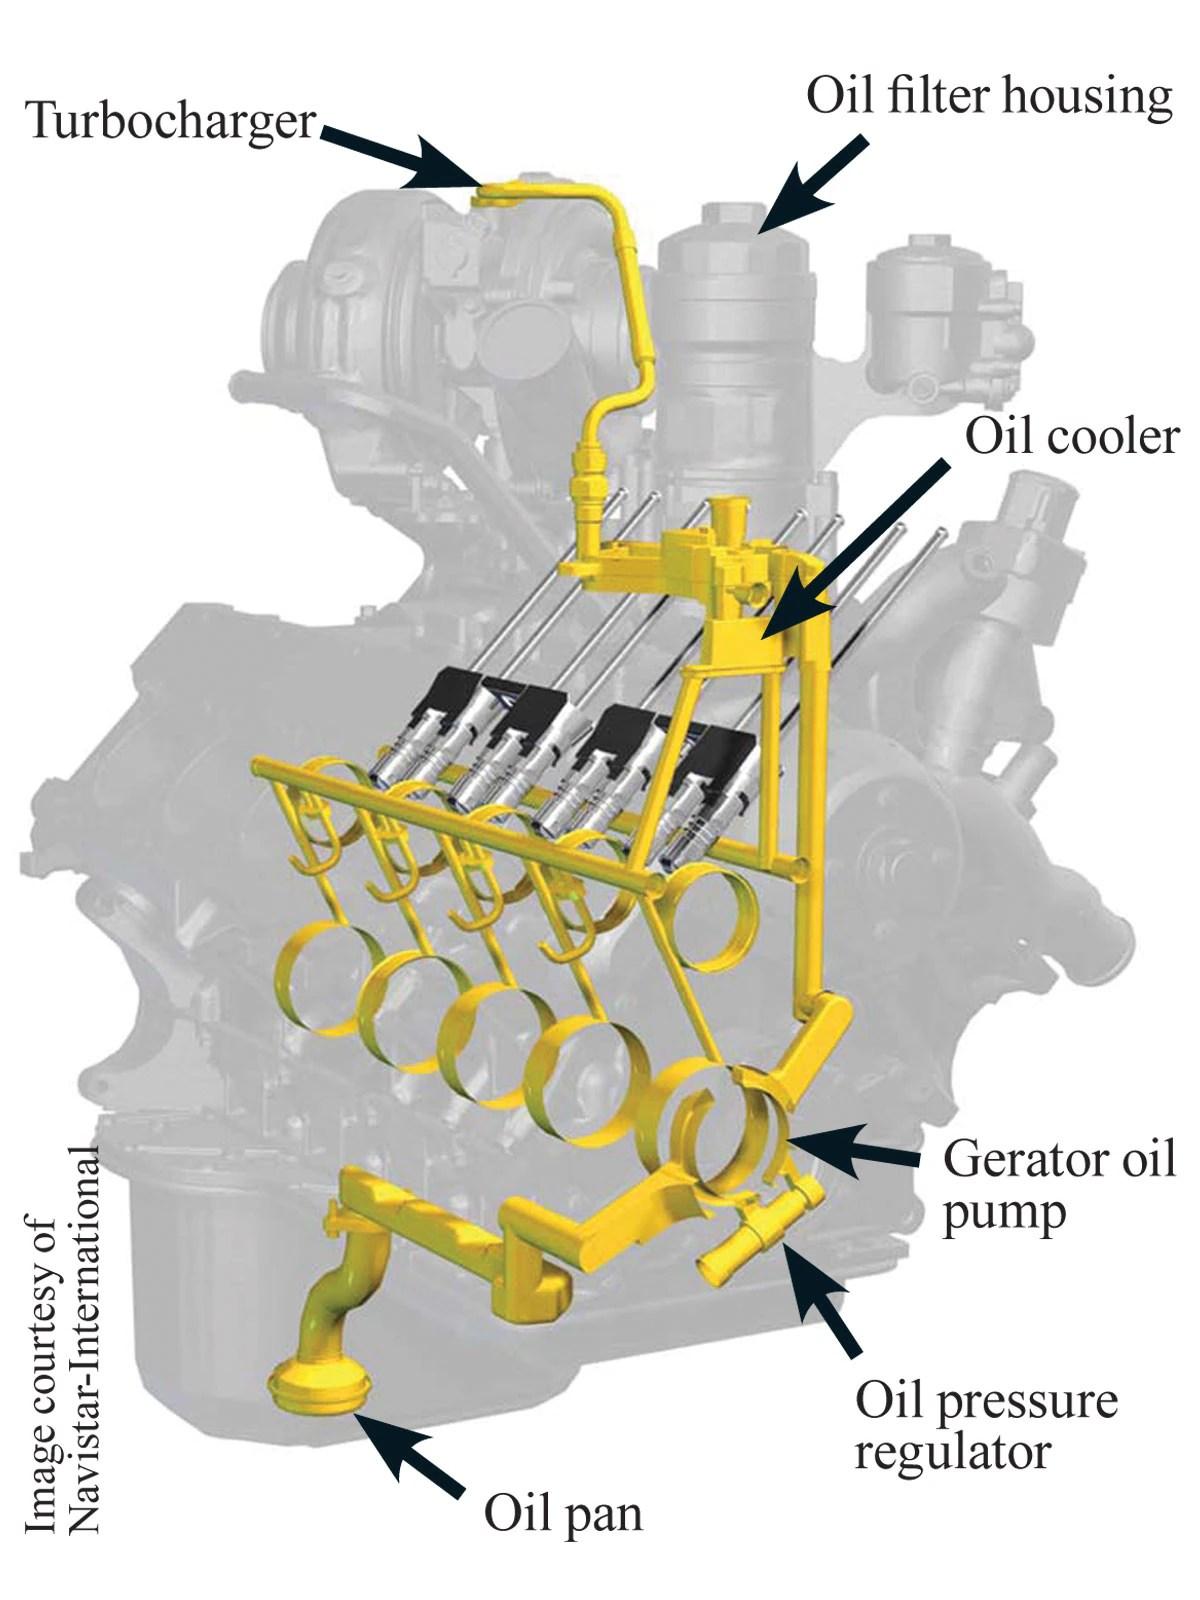 ford power stroke bulletproofing tactics oil distribution diagram photo 04 [ 1200 x 1600 Pixel ]